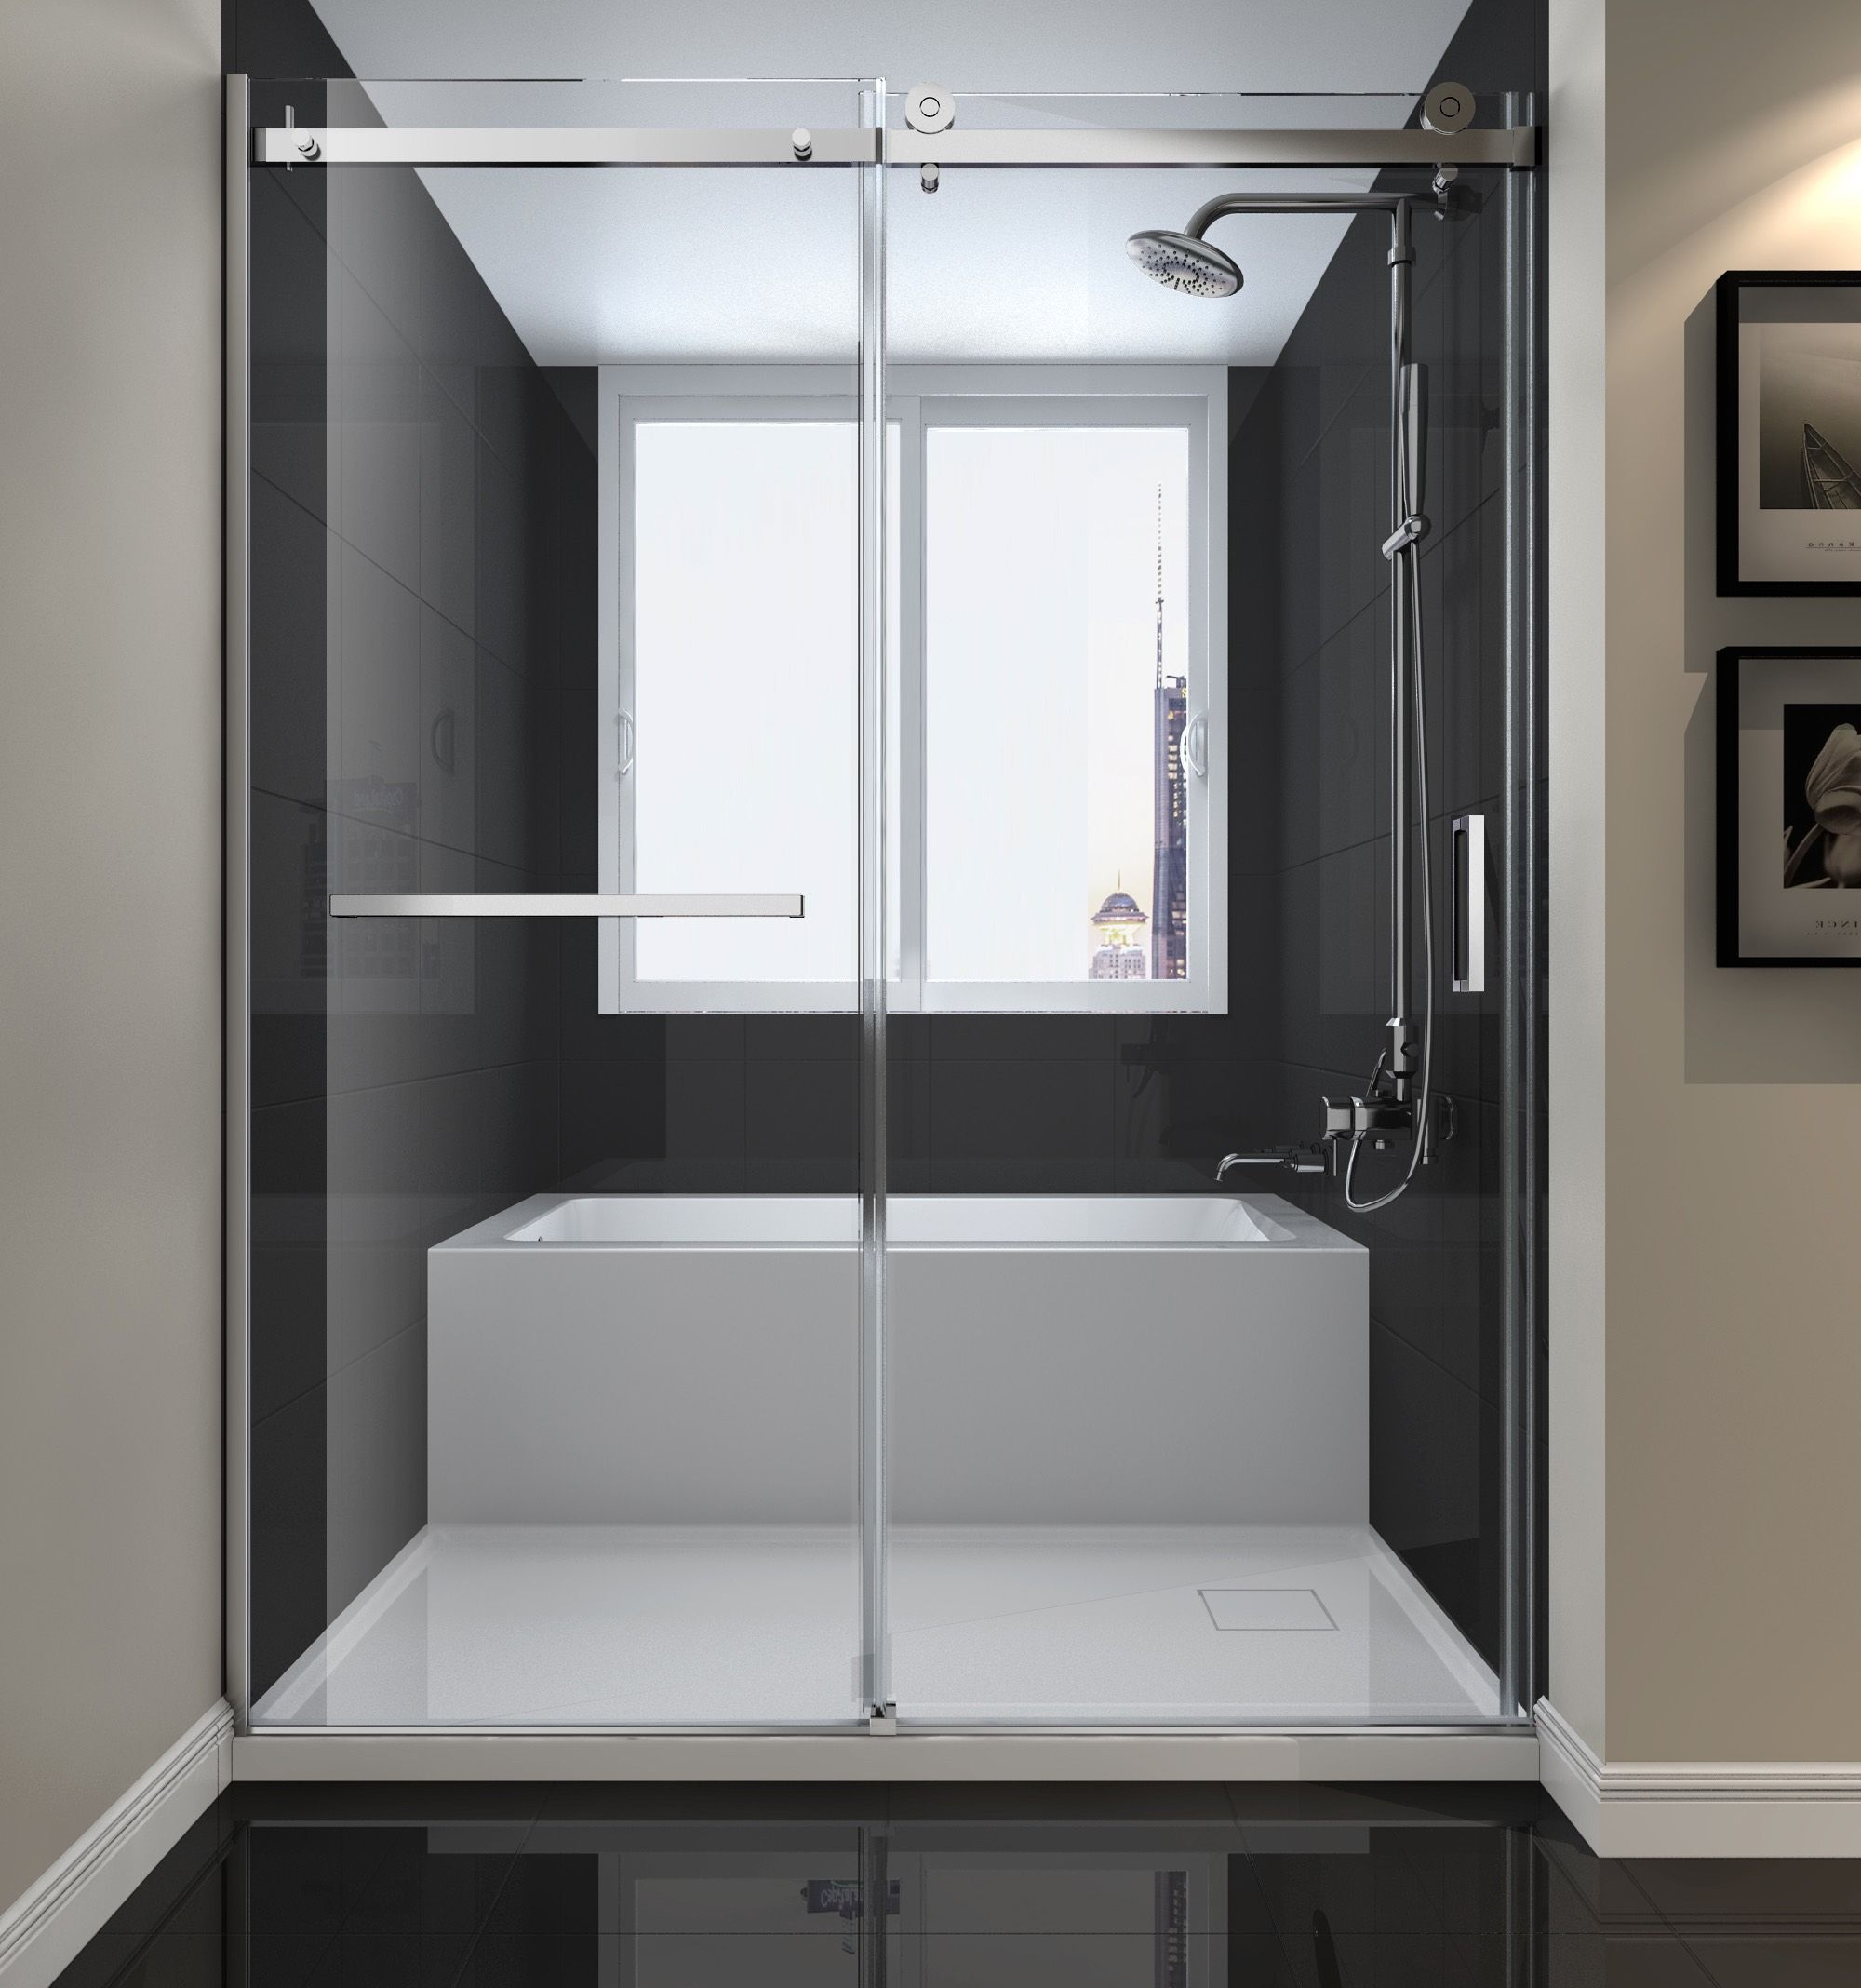 parallel mounting mp oceania bathroom ideas. Black Bedroom Furniture Sets. Home Design Ideas